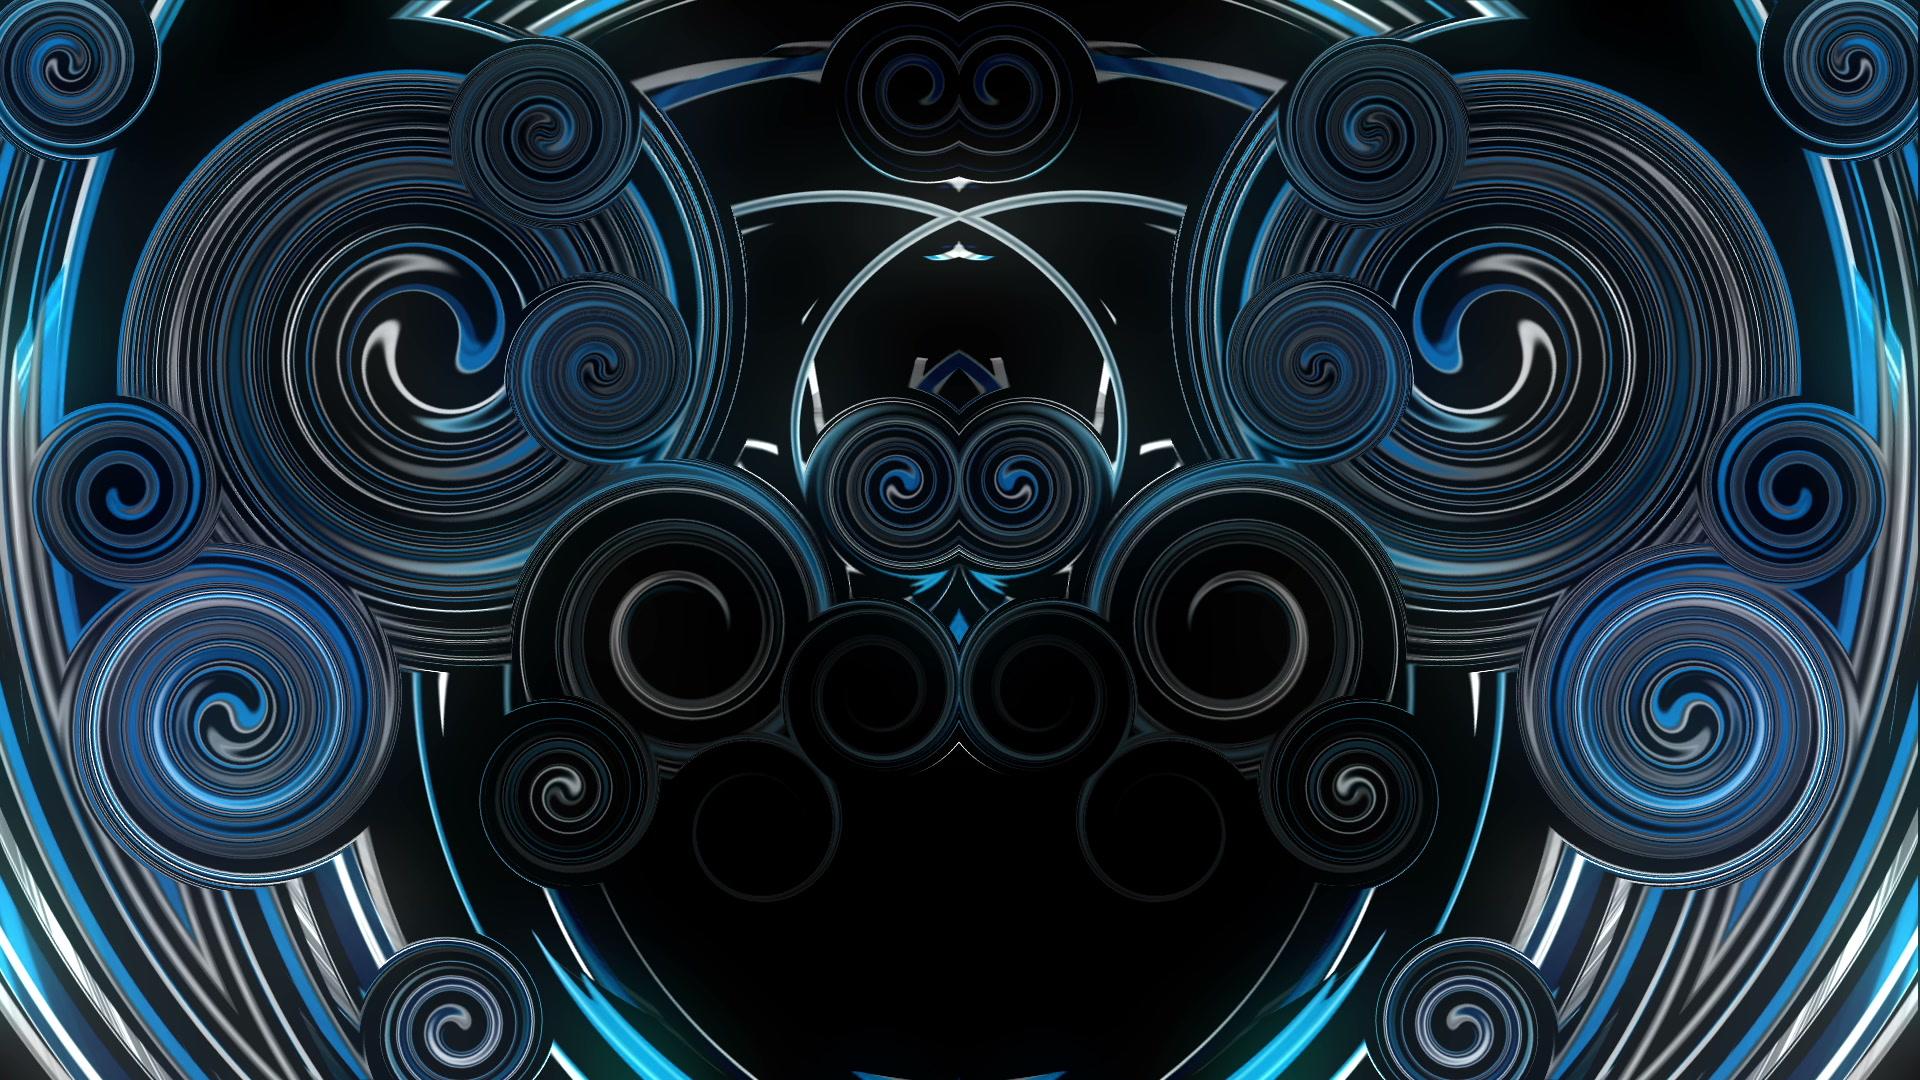 vj video background Twirl-Mask-Vj-Loop-LIMEART_003